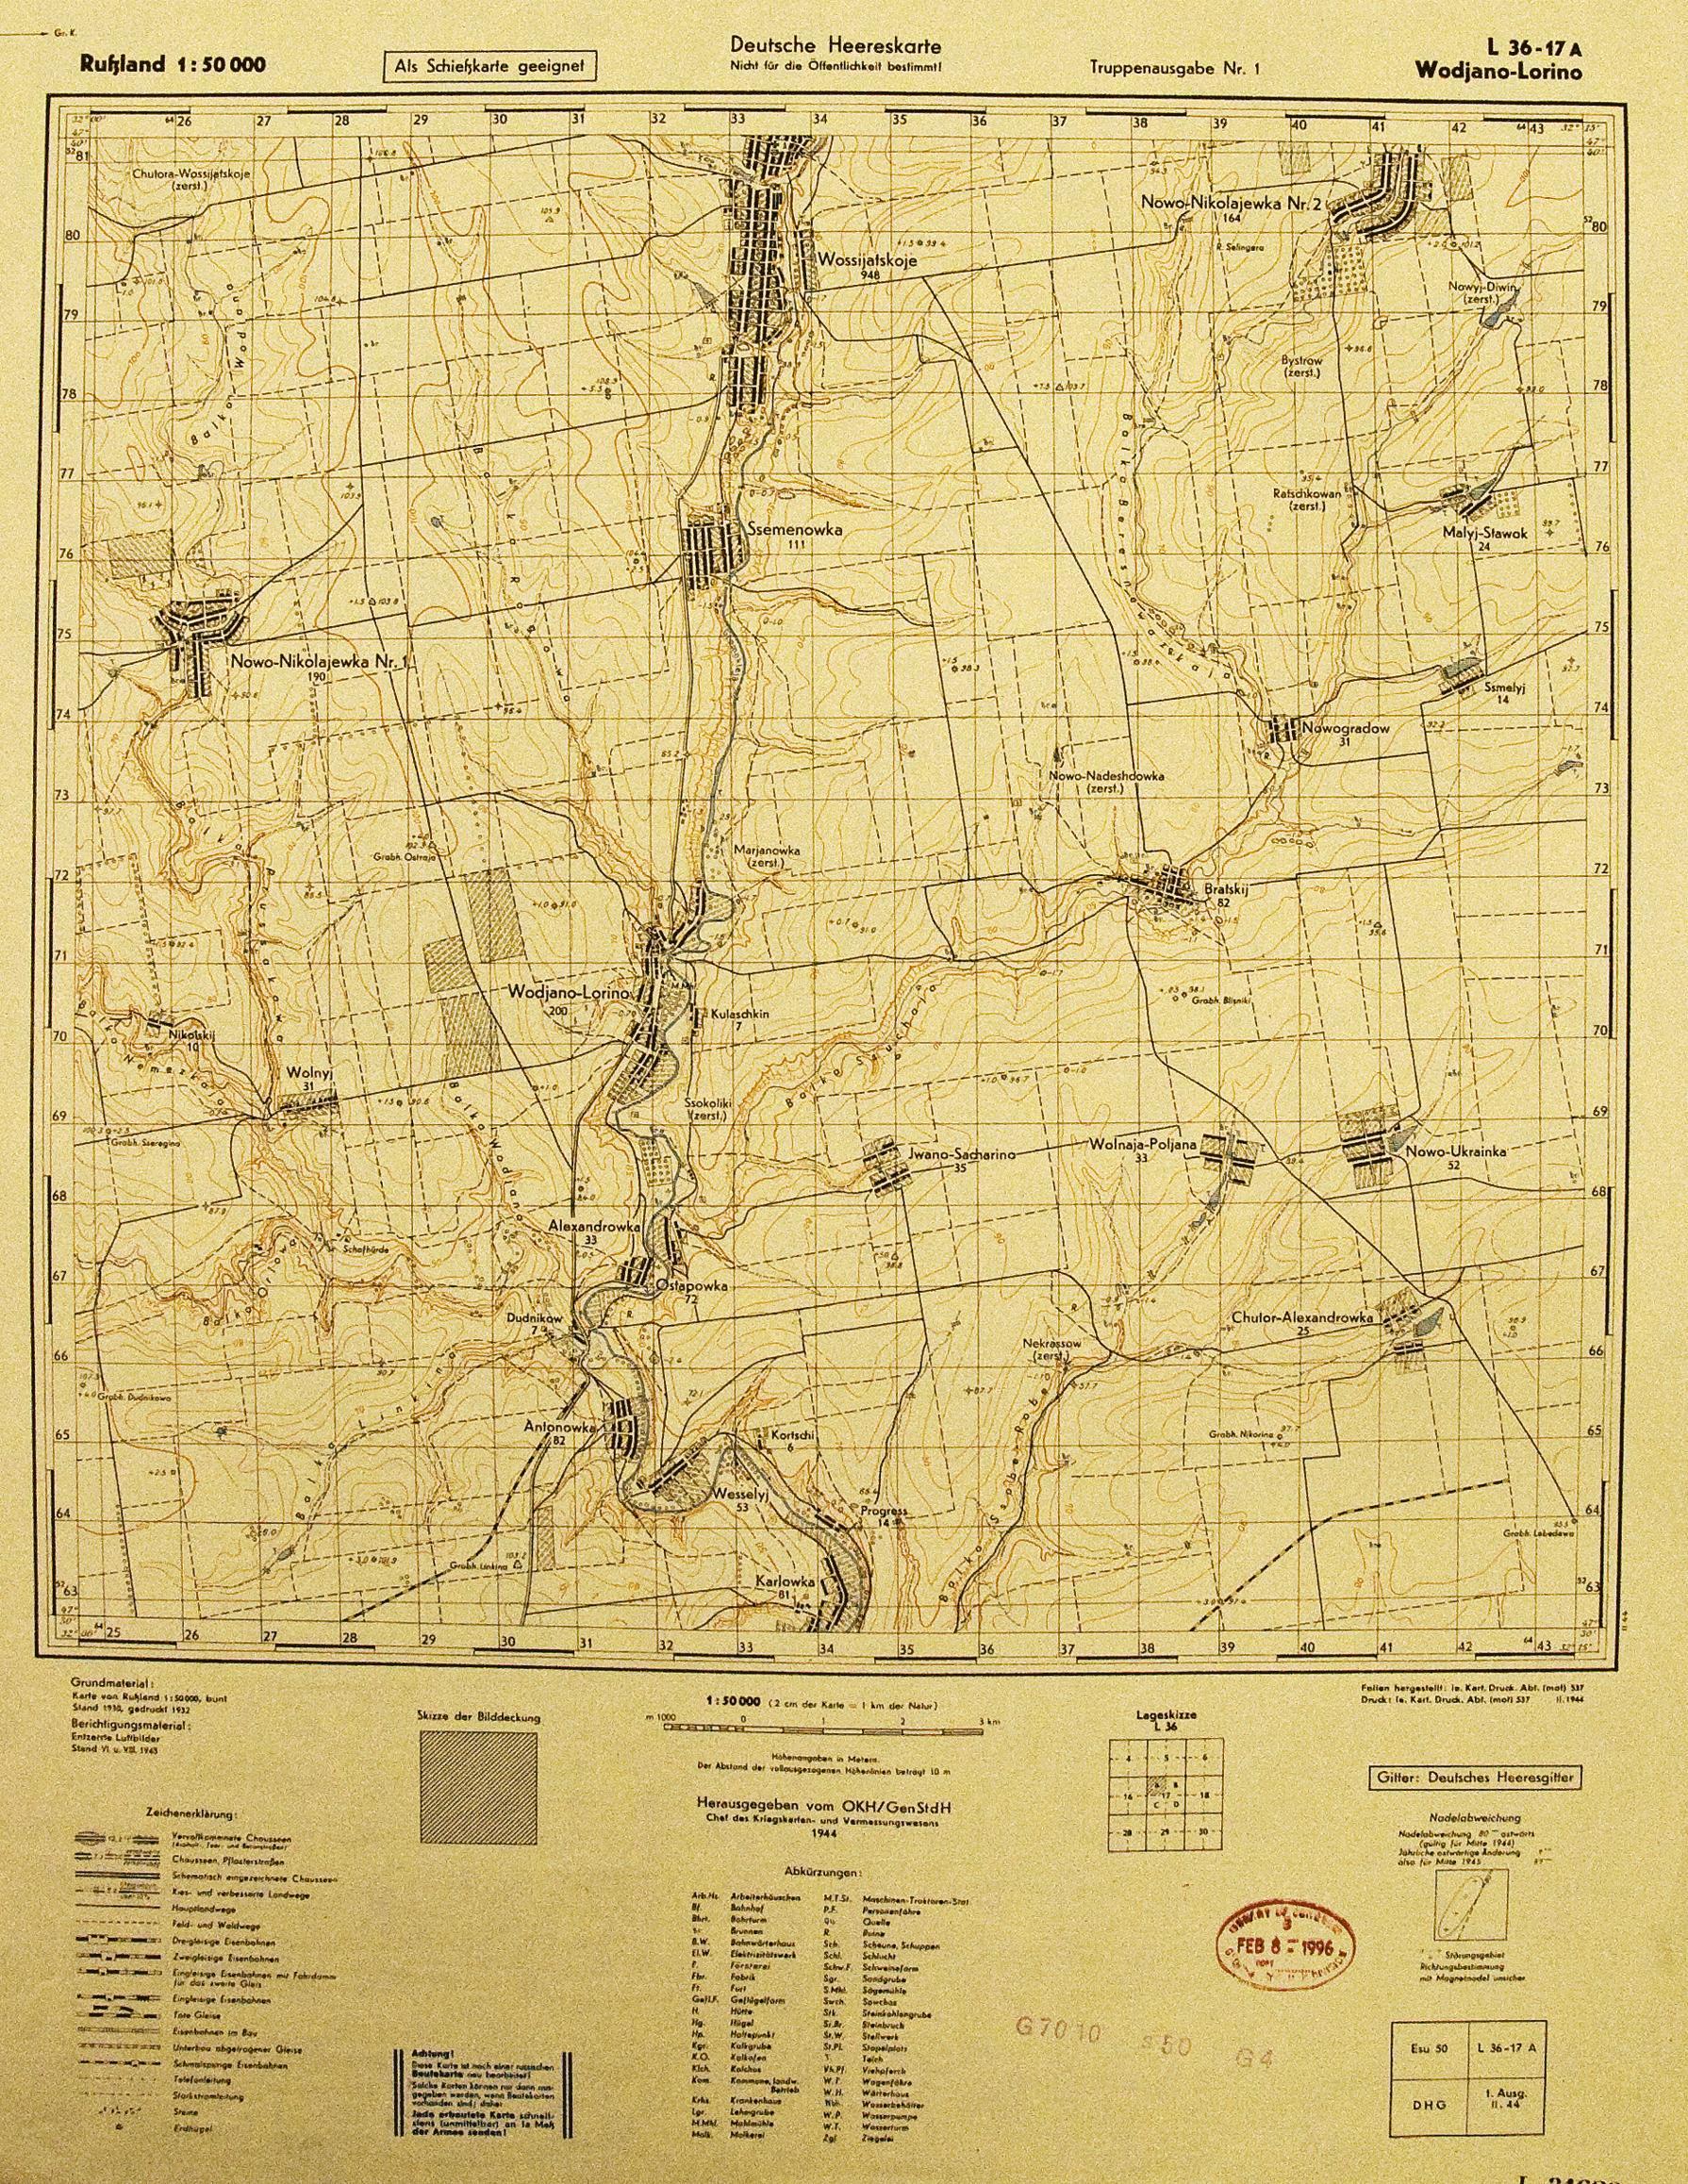 Карта РККА L-36-17 (500m)